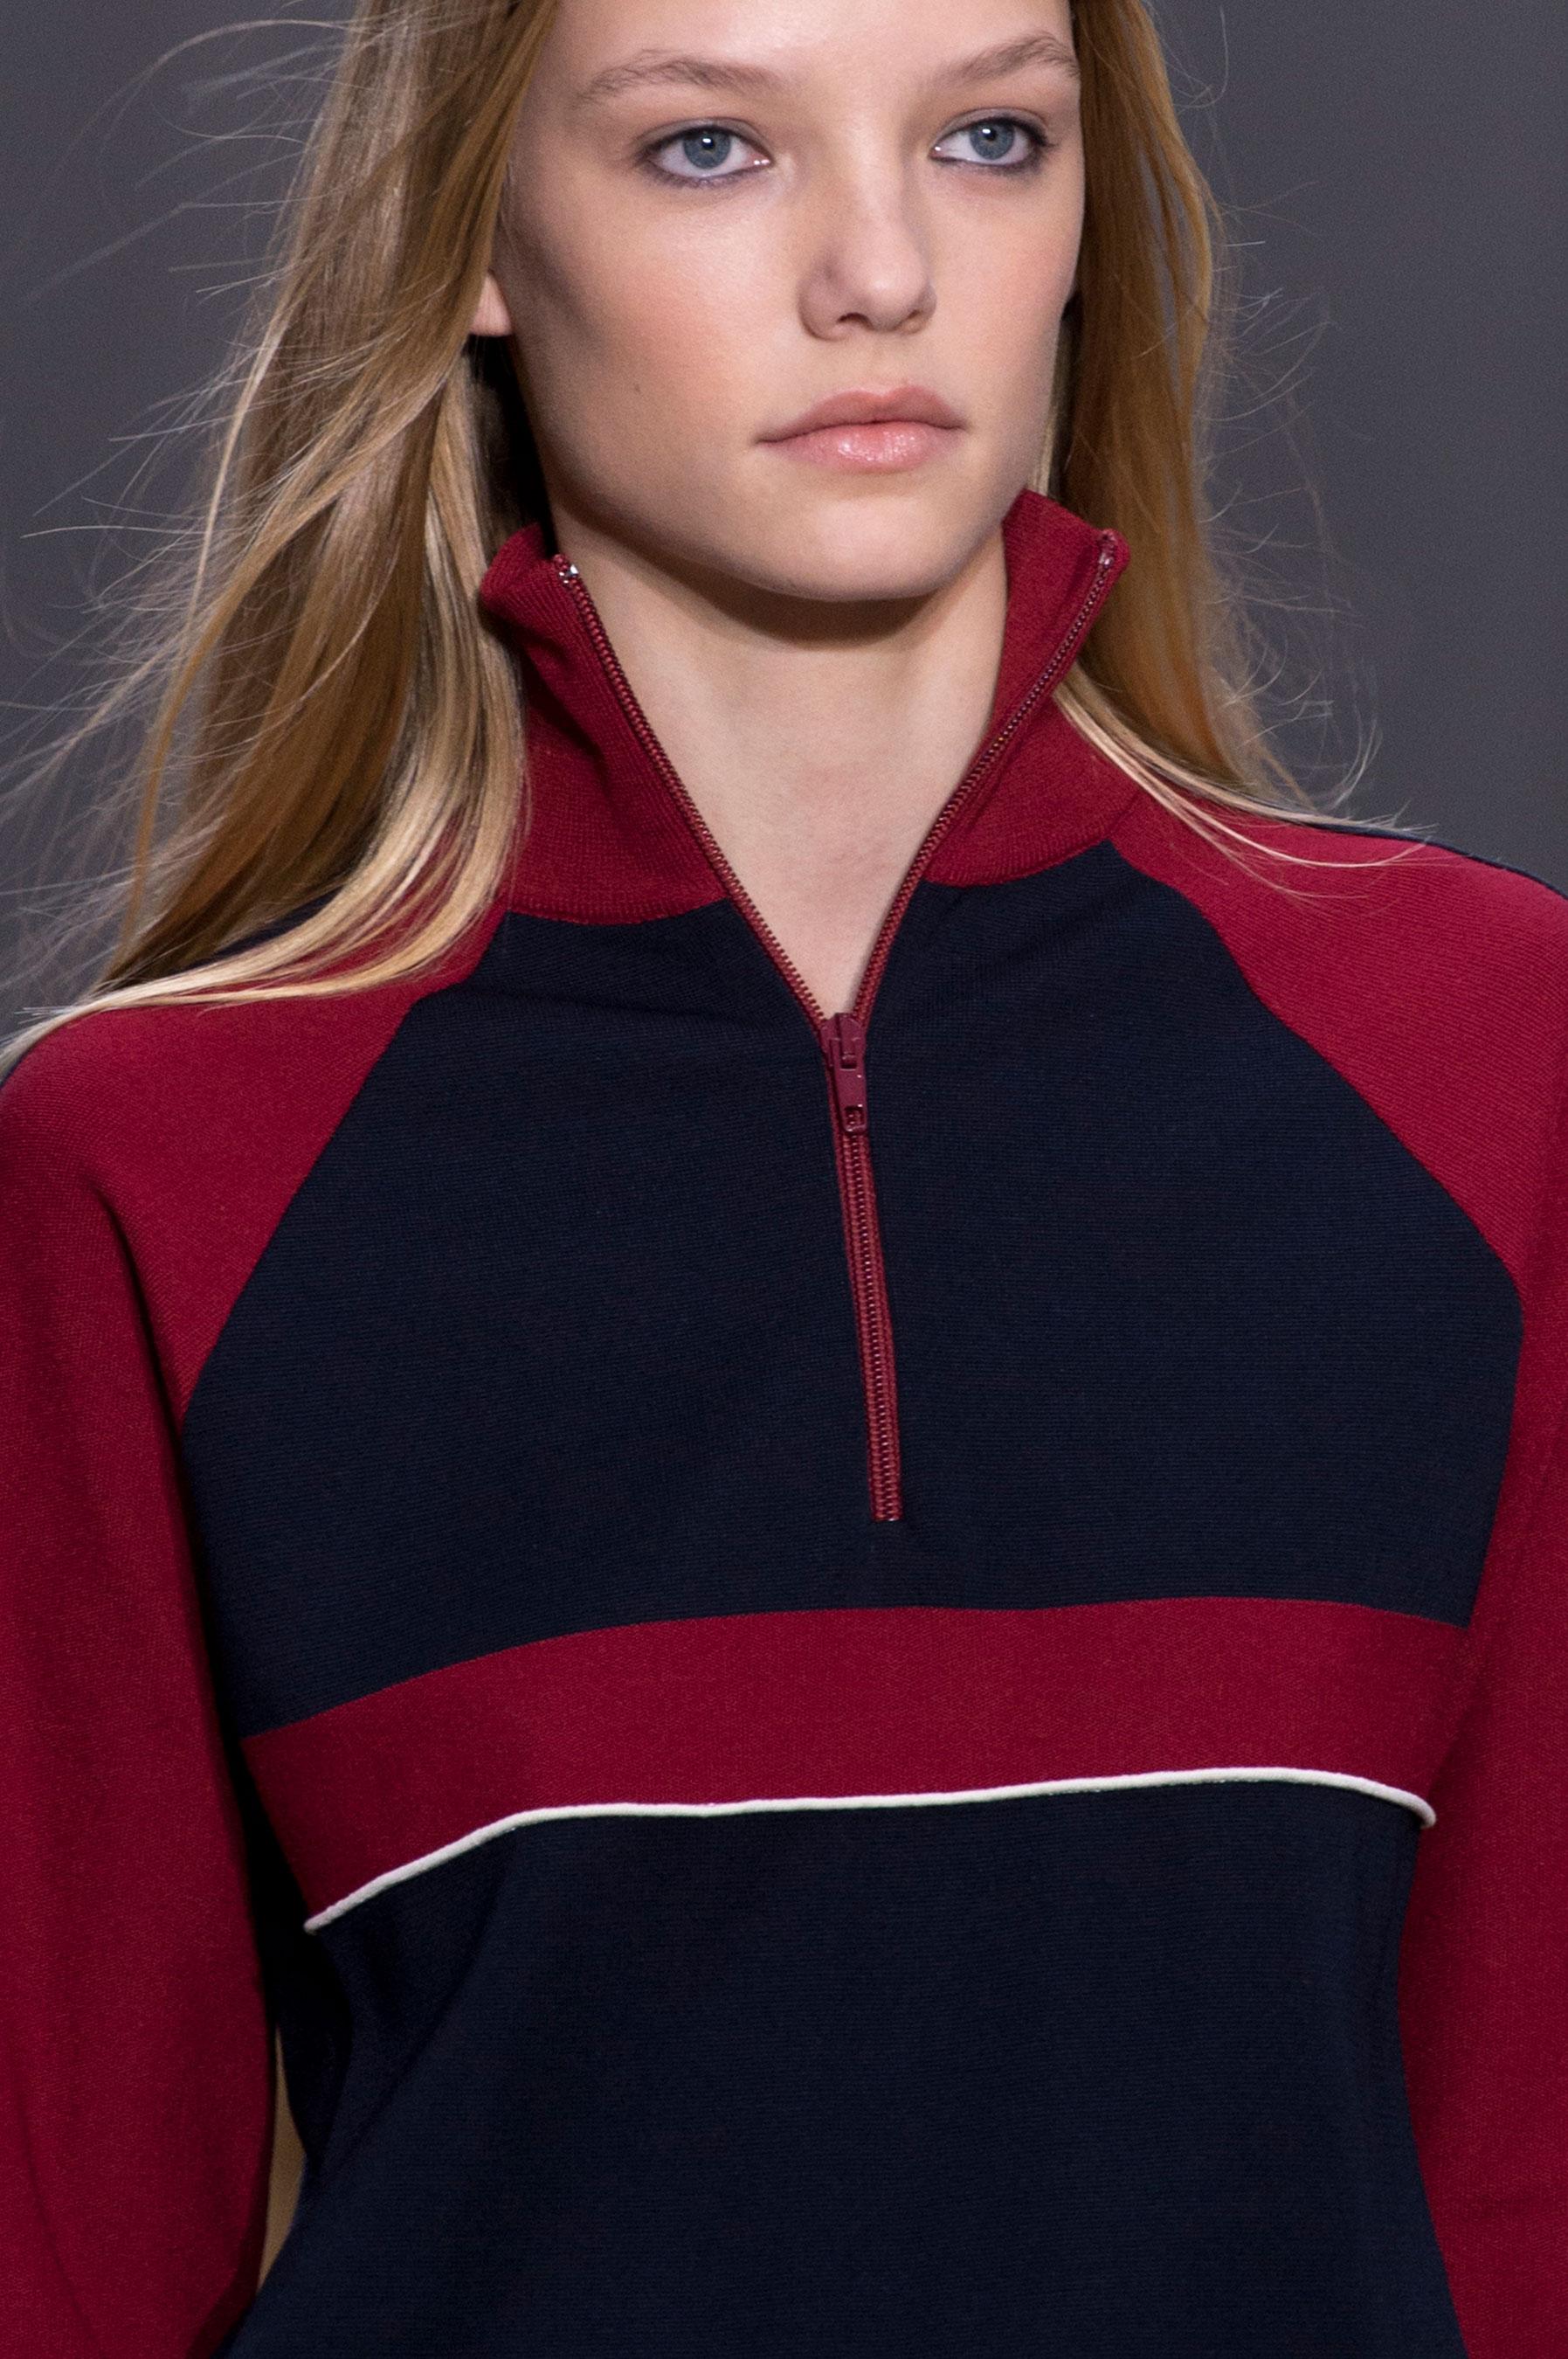 Chloe-spring-2016-runway-beauty-fashion-show-the-impression-02